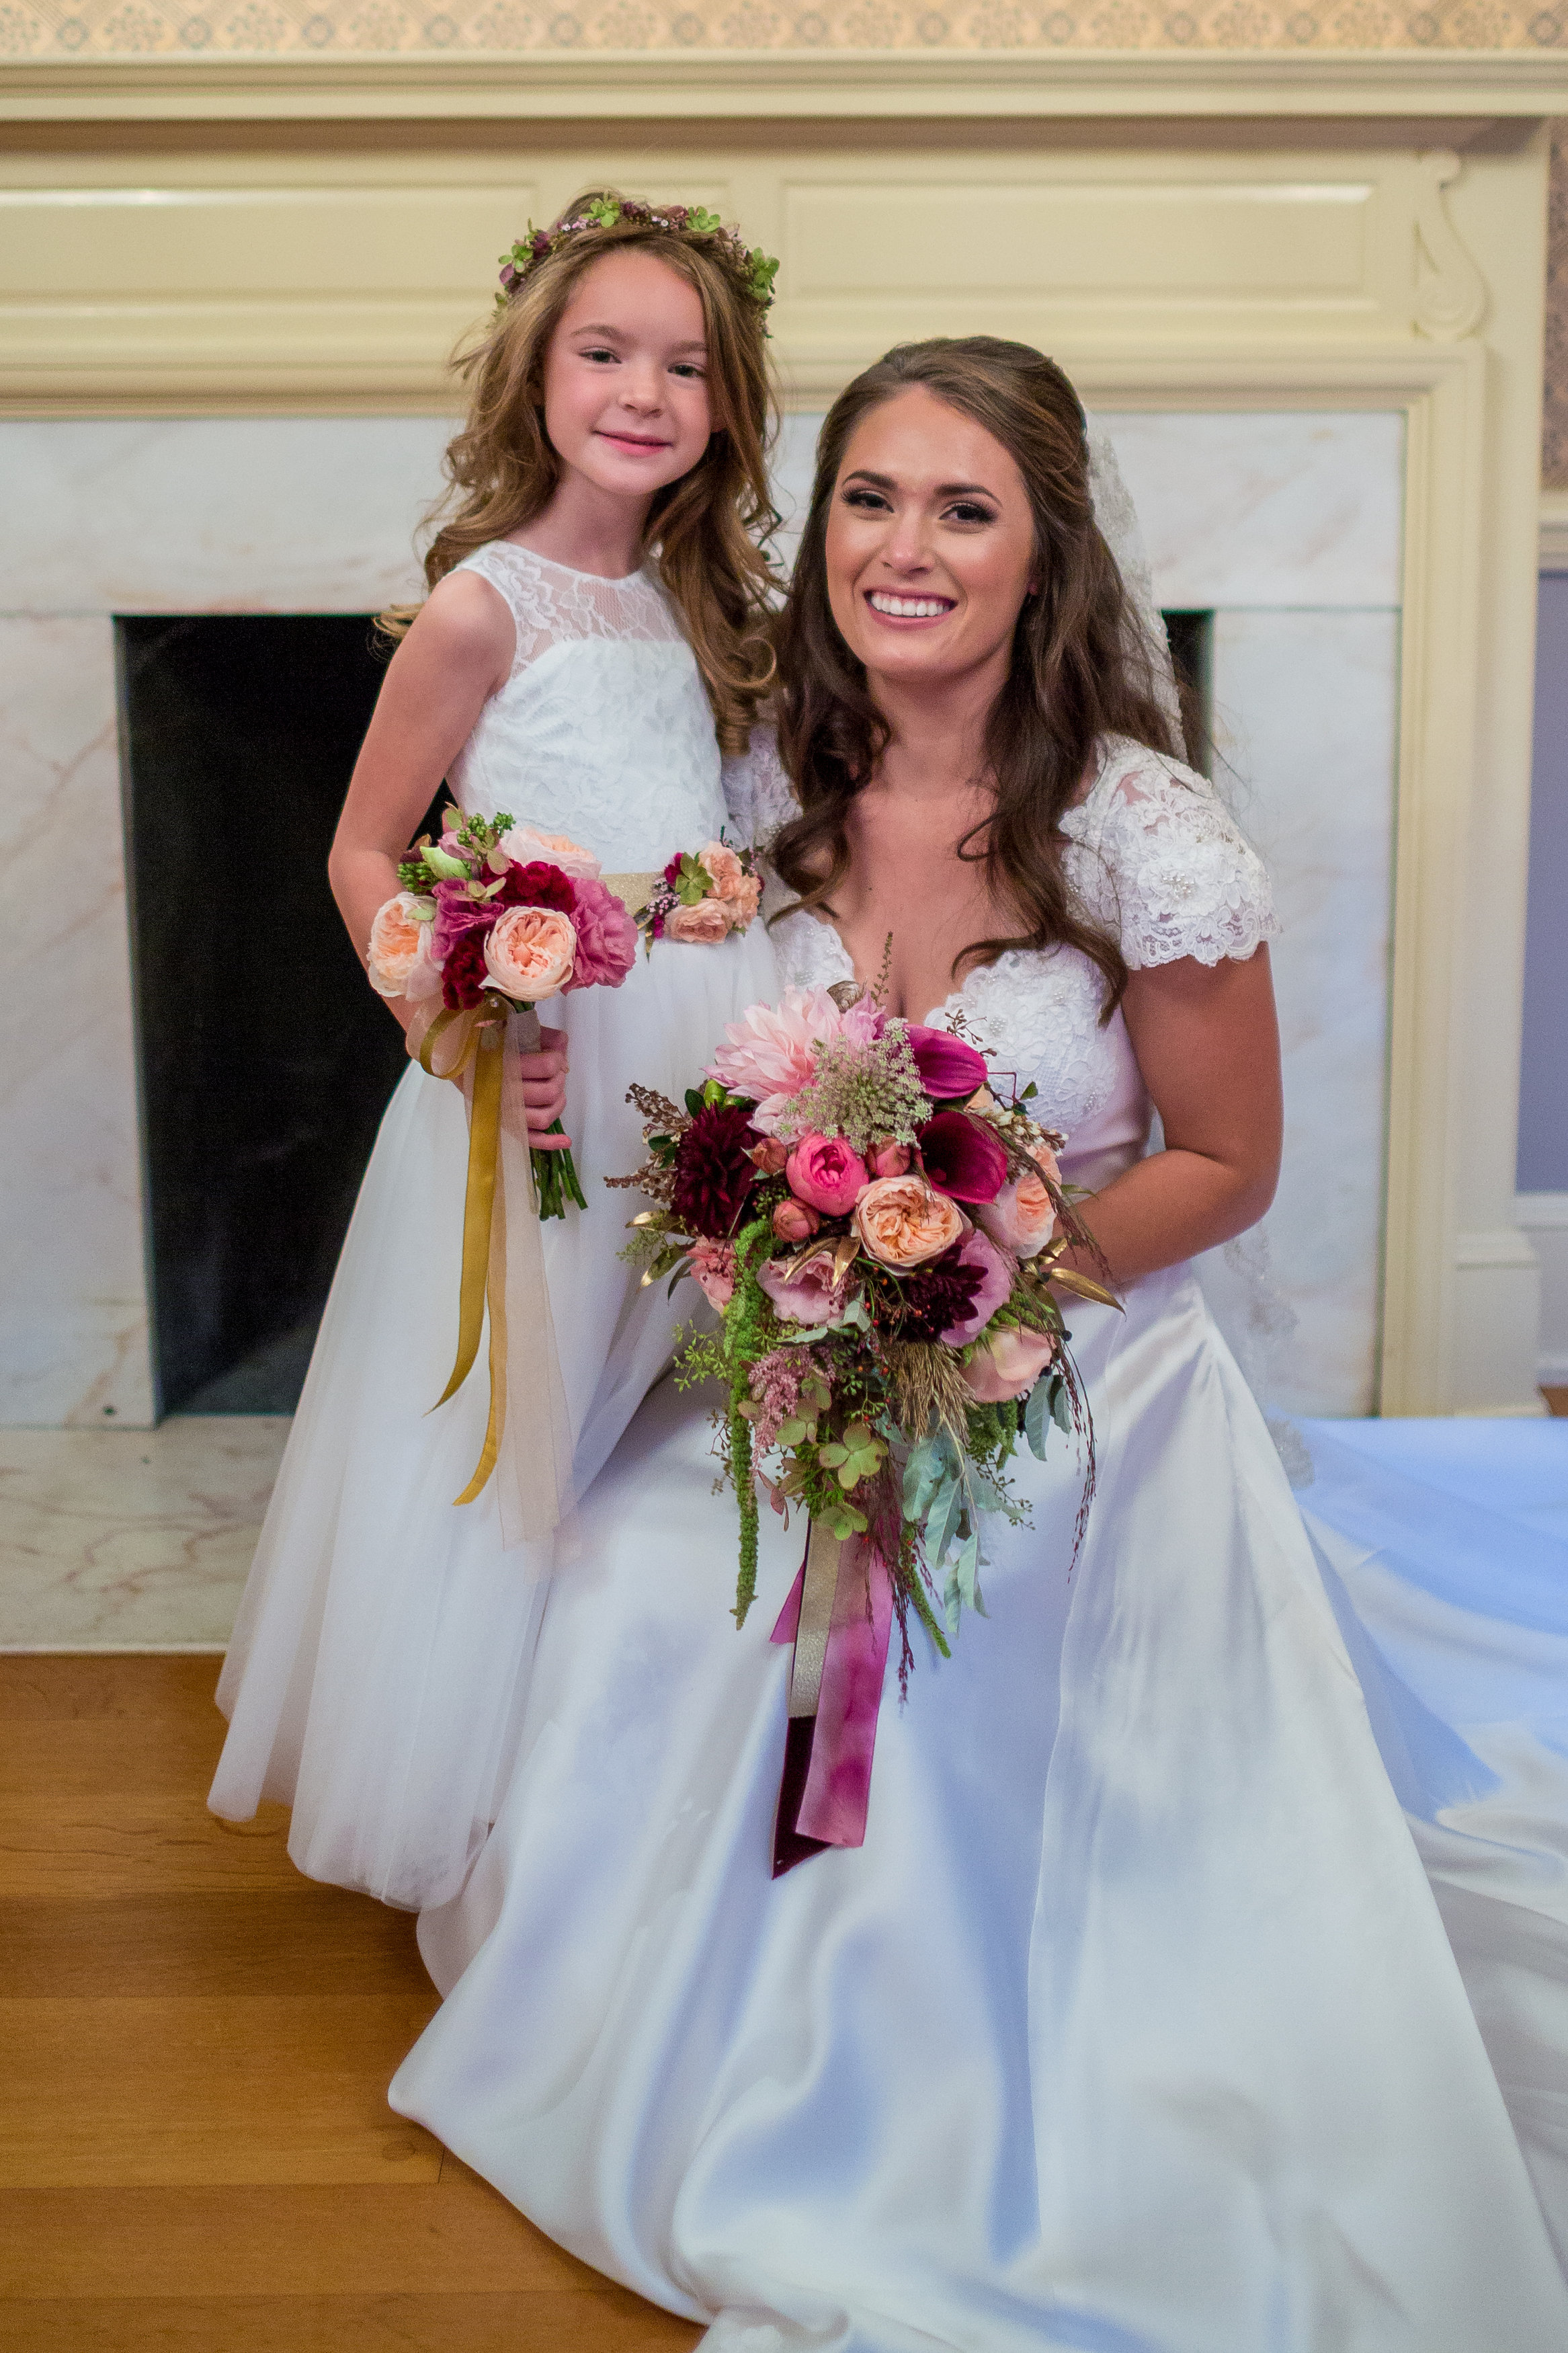 Delaware Wedding, Brantwyn Estate, Fall Bride, Flower Girl Crown, Bouquet, Tami & Ryan Photography